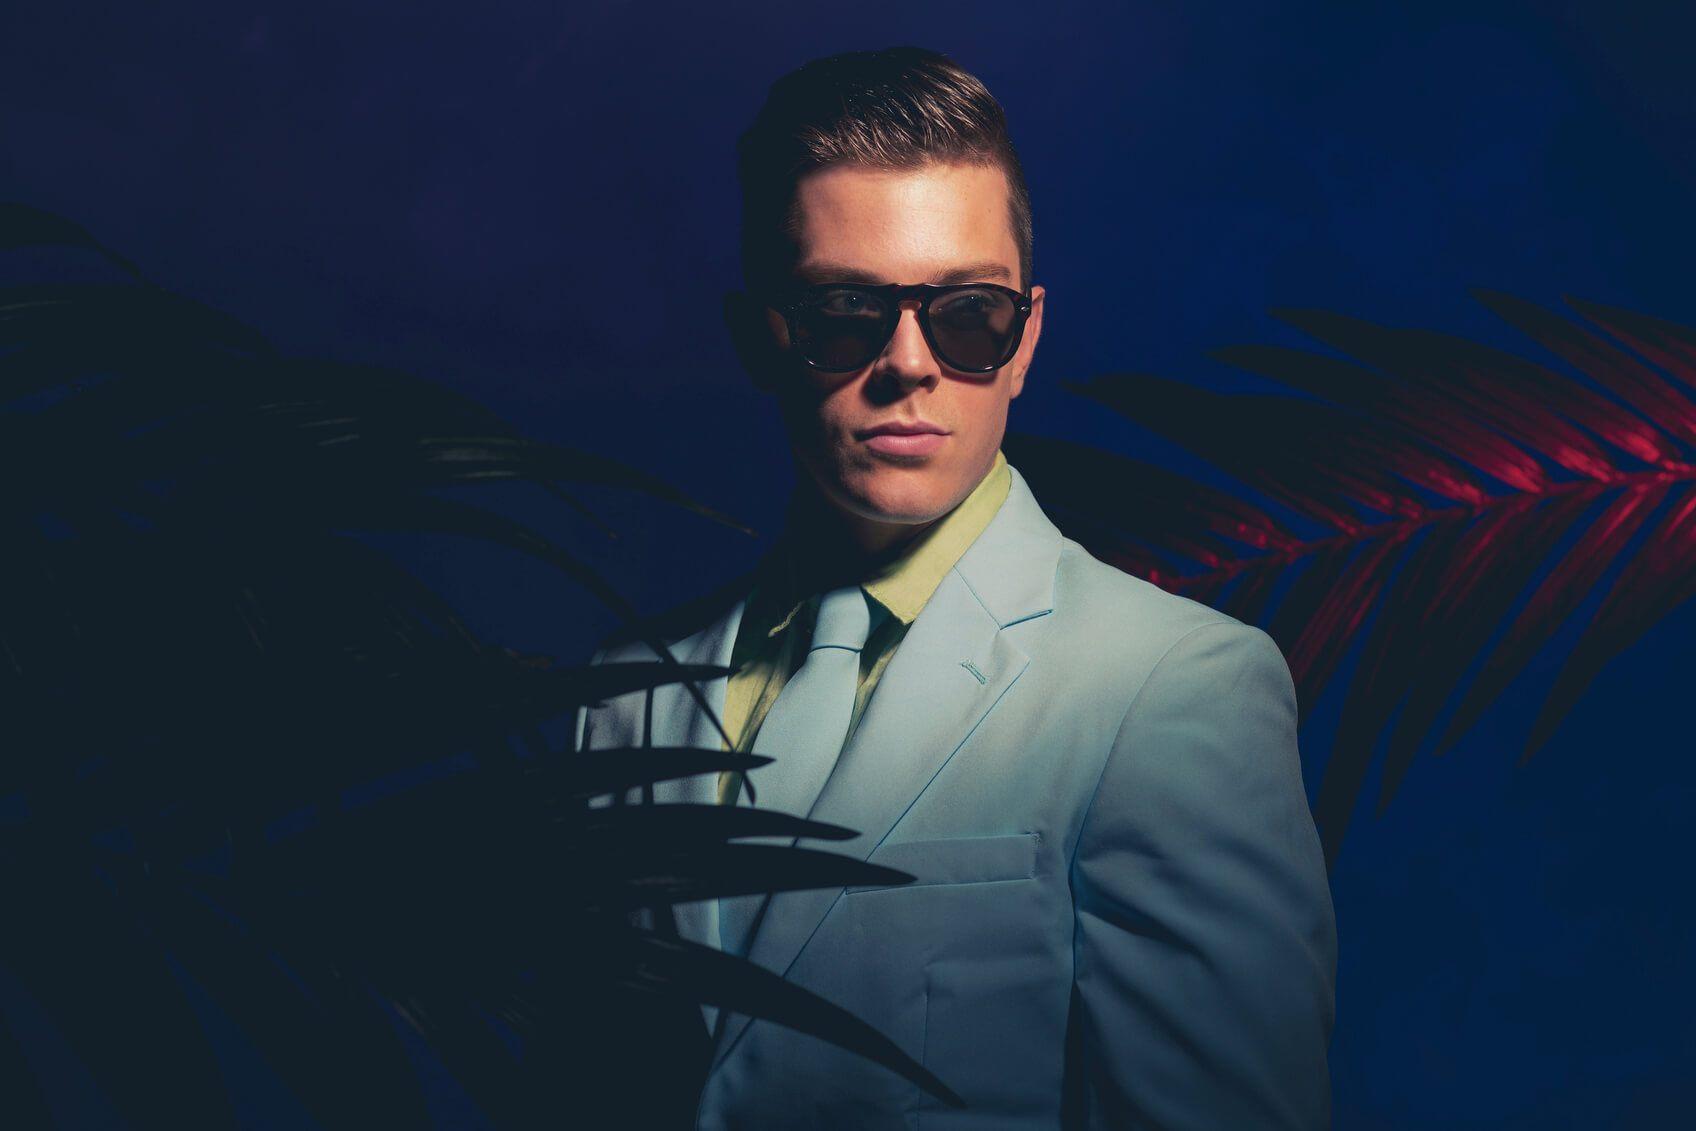 '80s halloween hair Miami Vice